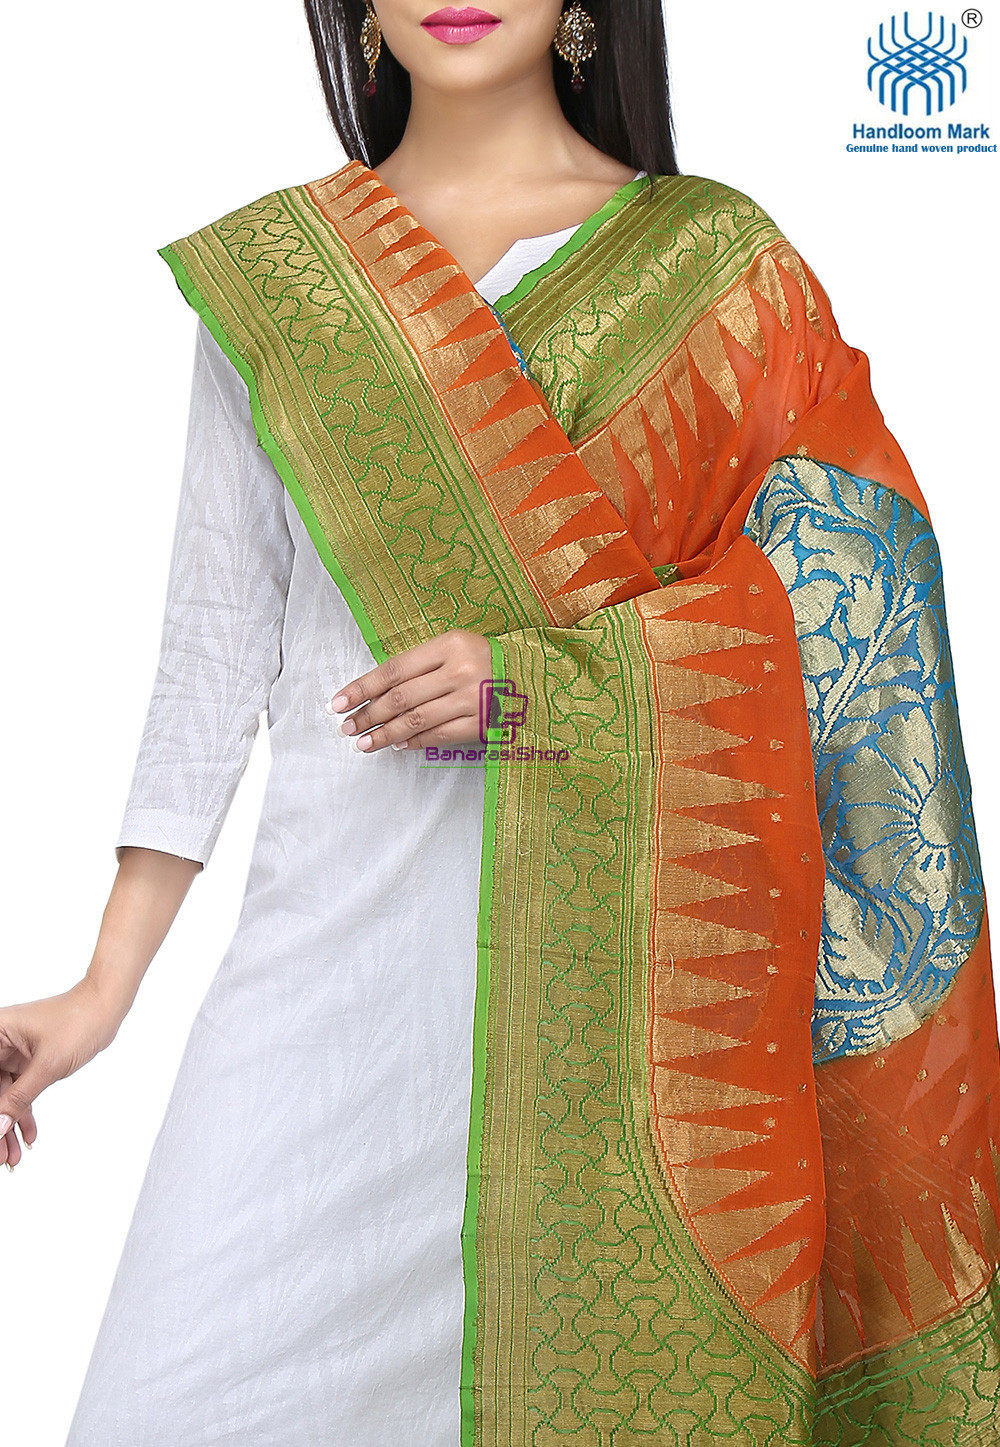 Handloom Banarasi Pure Georgette Dupatta in Orange and Green 2